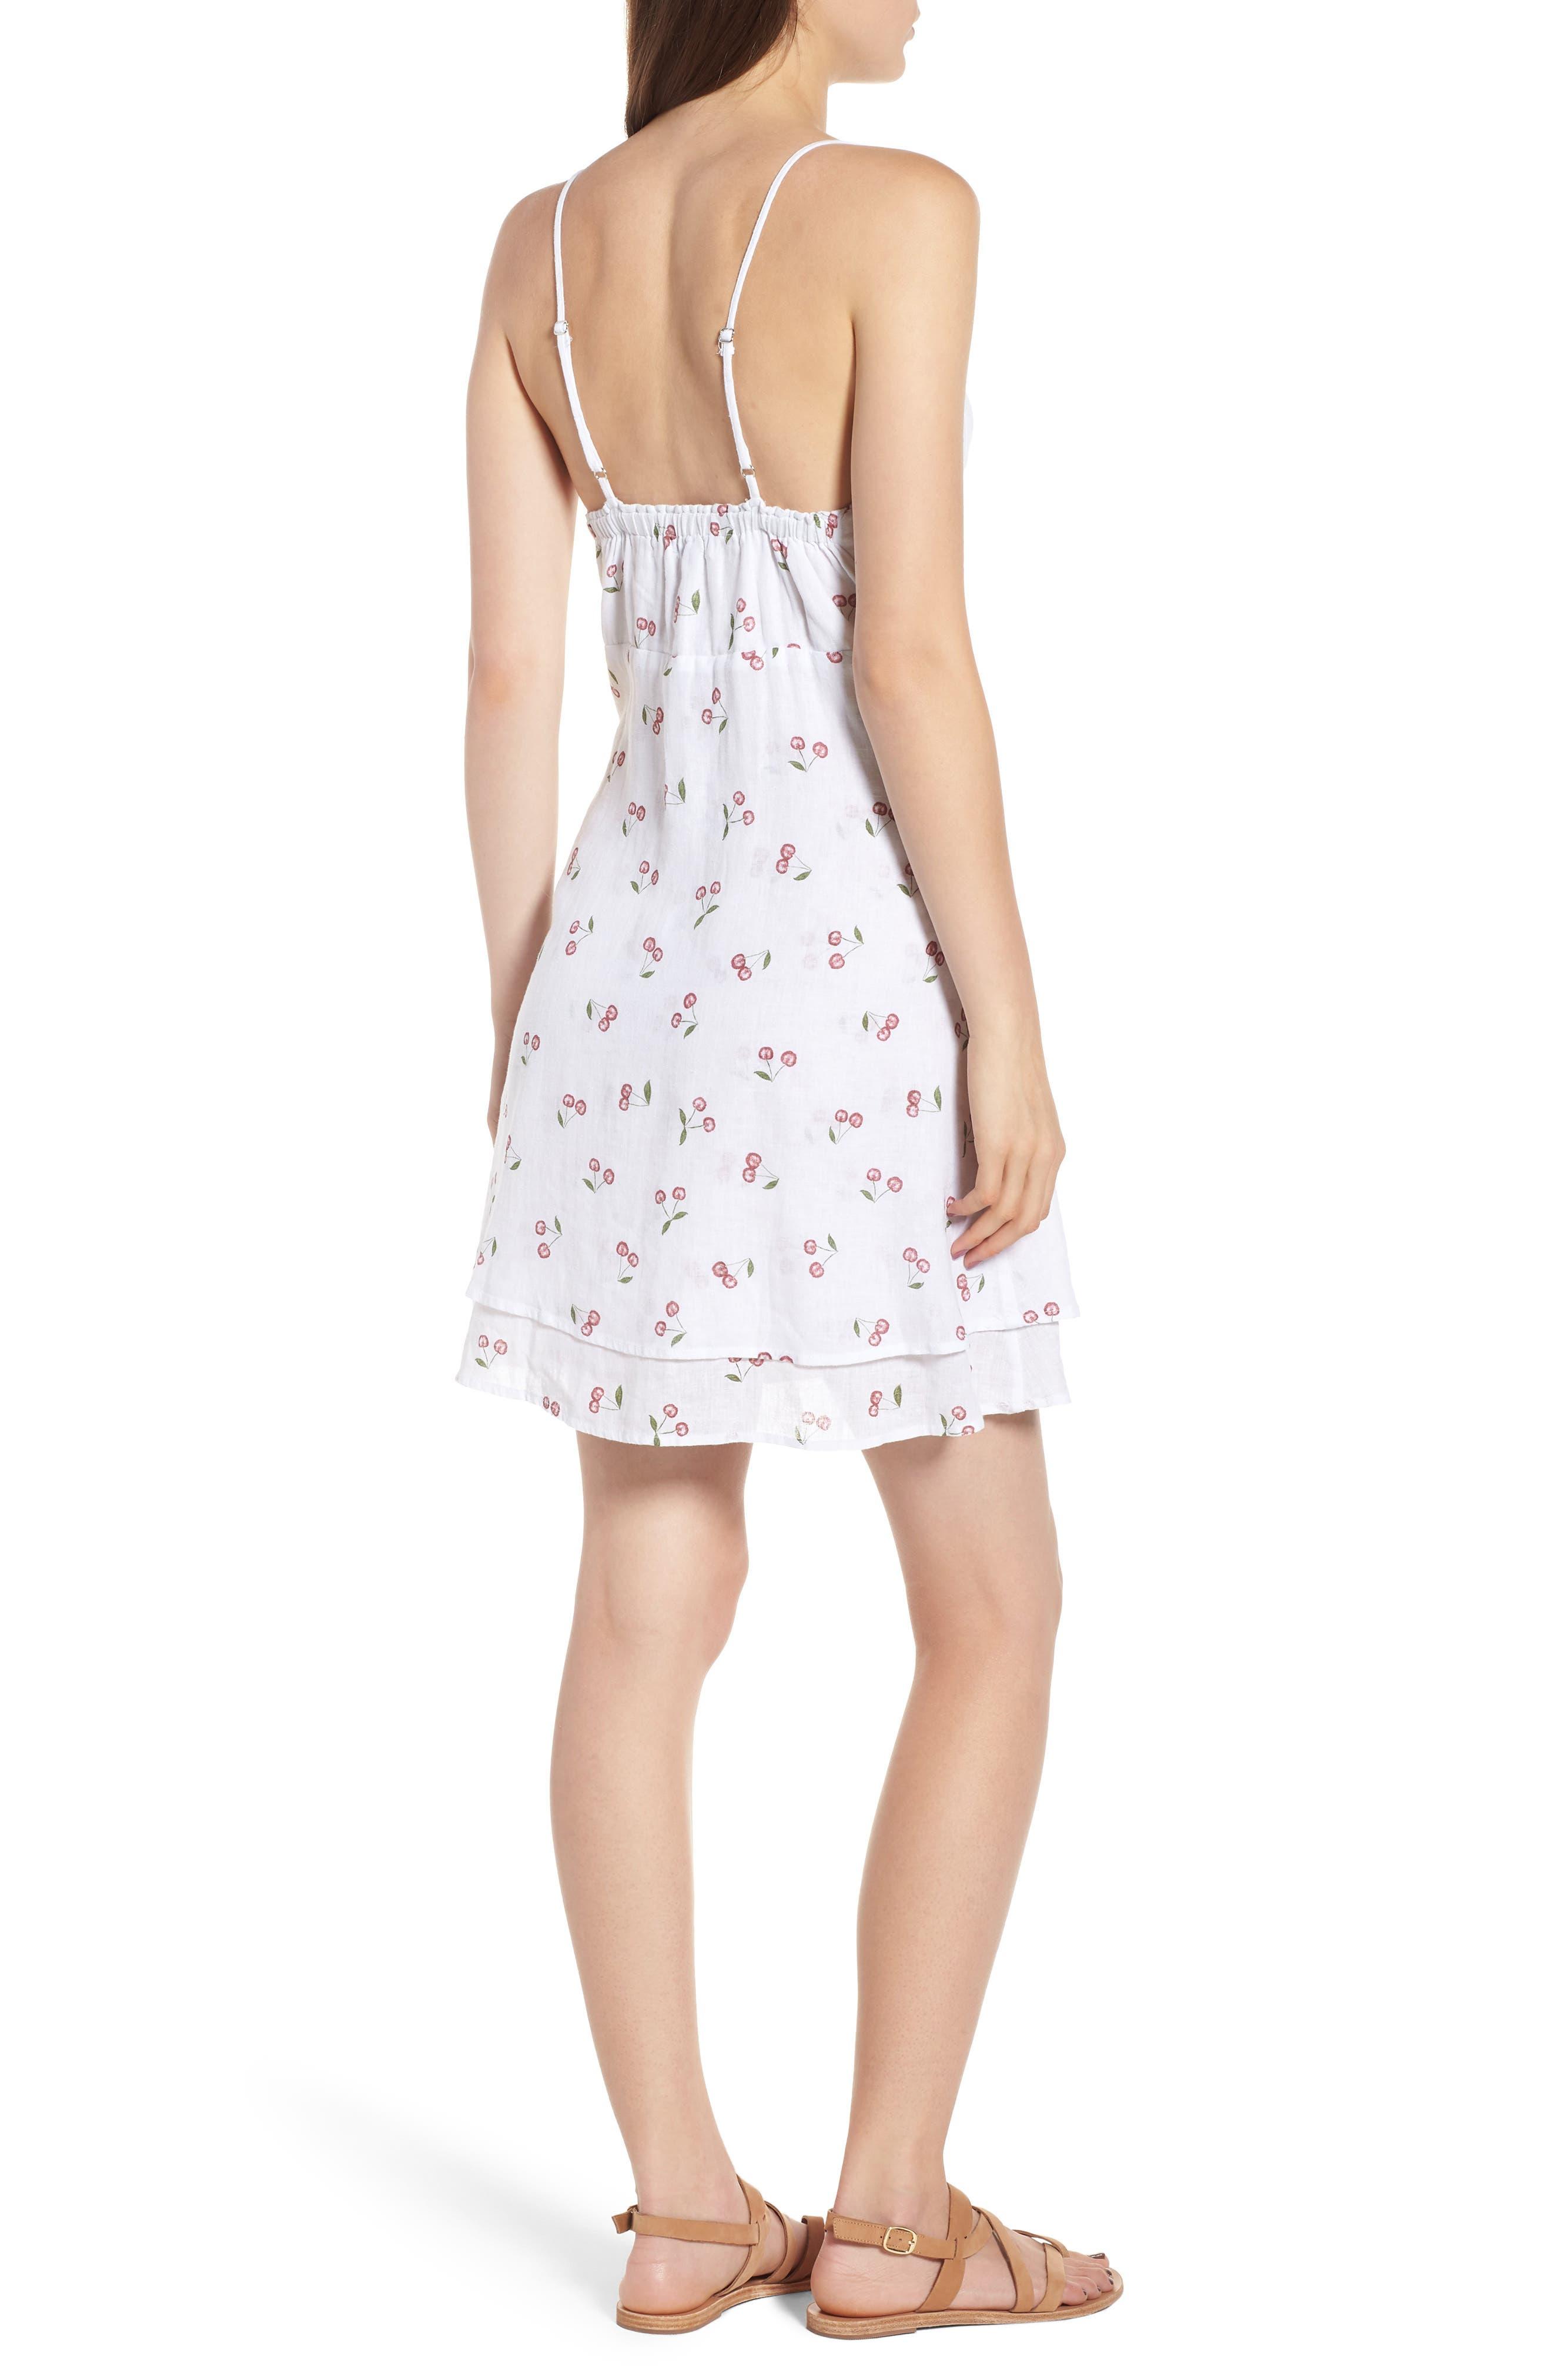 August Daisy Tie Front Dress,                             Alternate thumbnail 2, color,                             WHITE CHERRIES